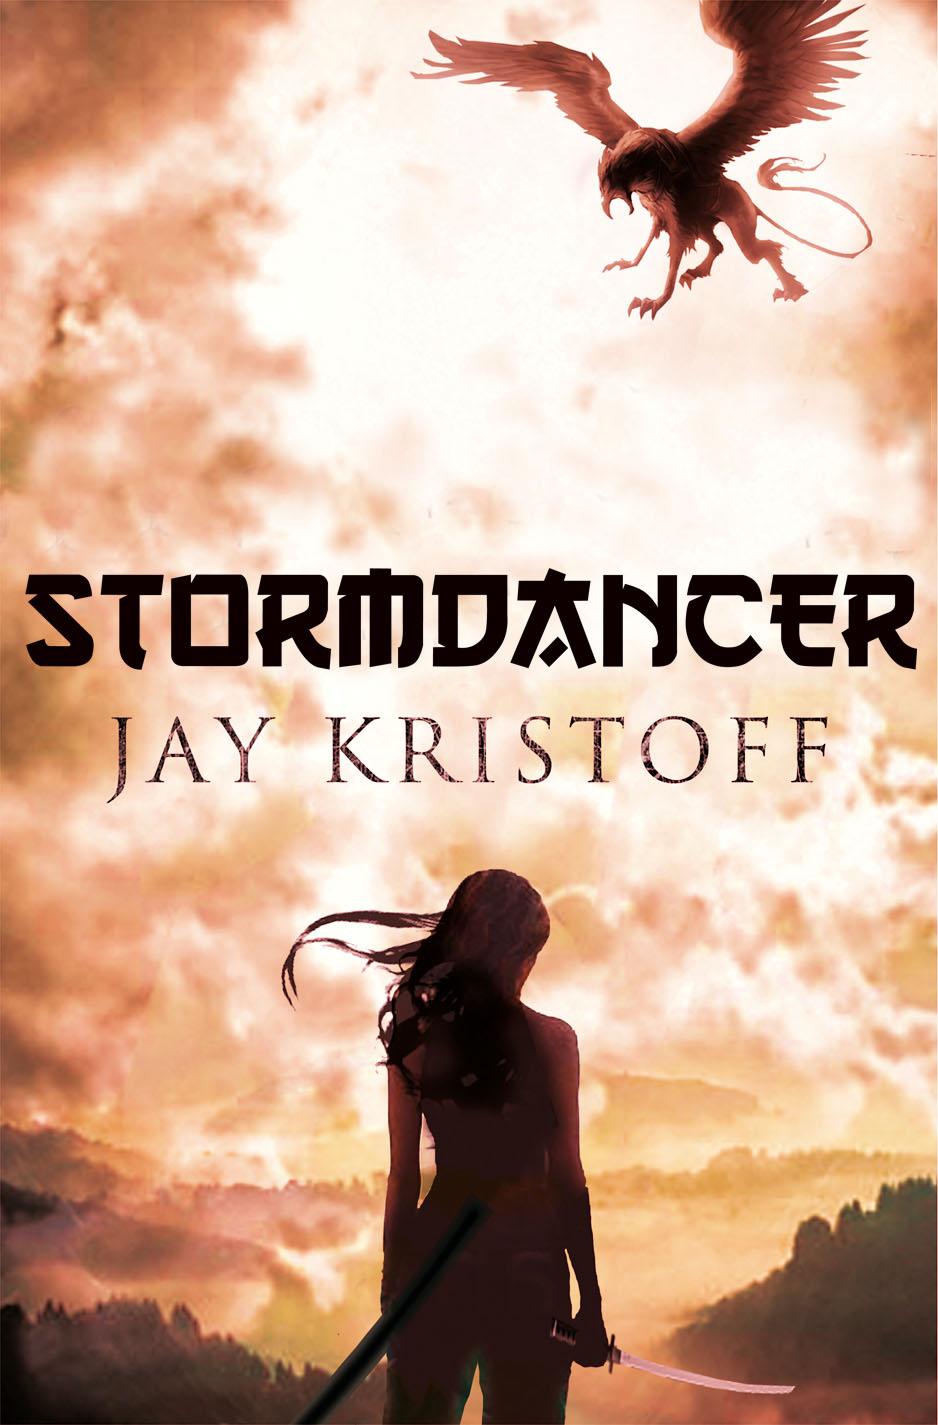 Stormdancer cover process